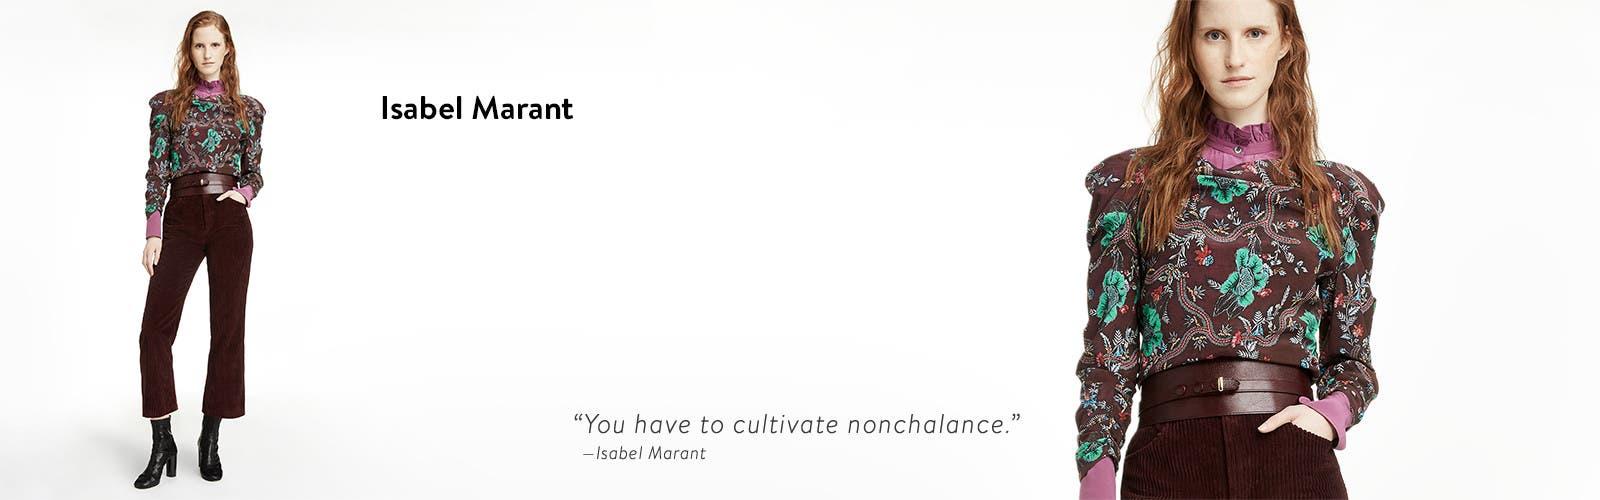 Isabel Marant.